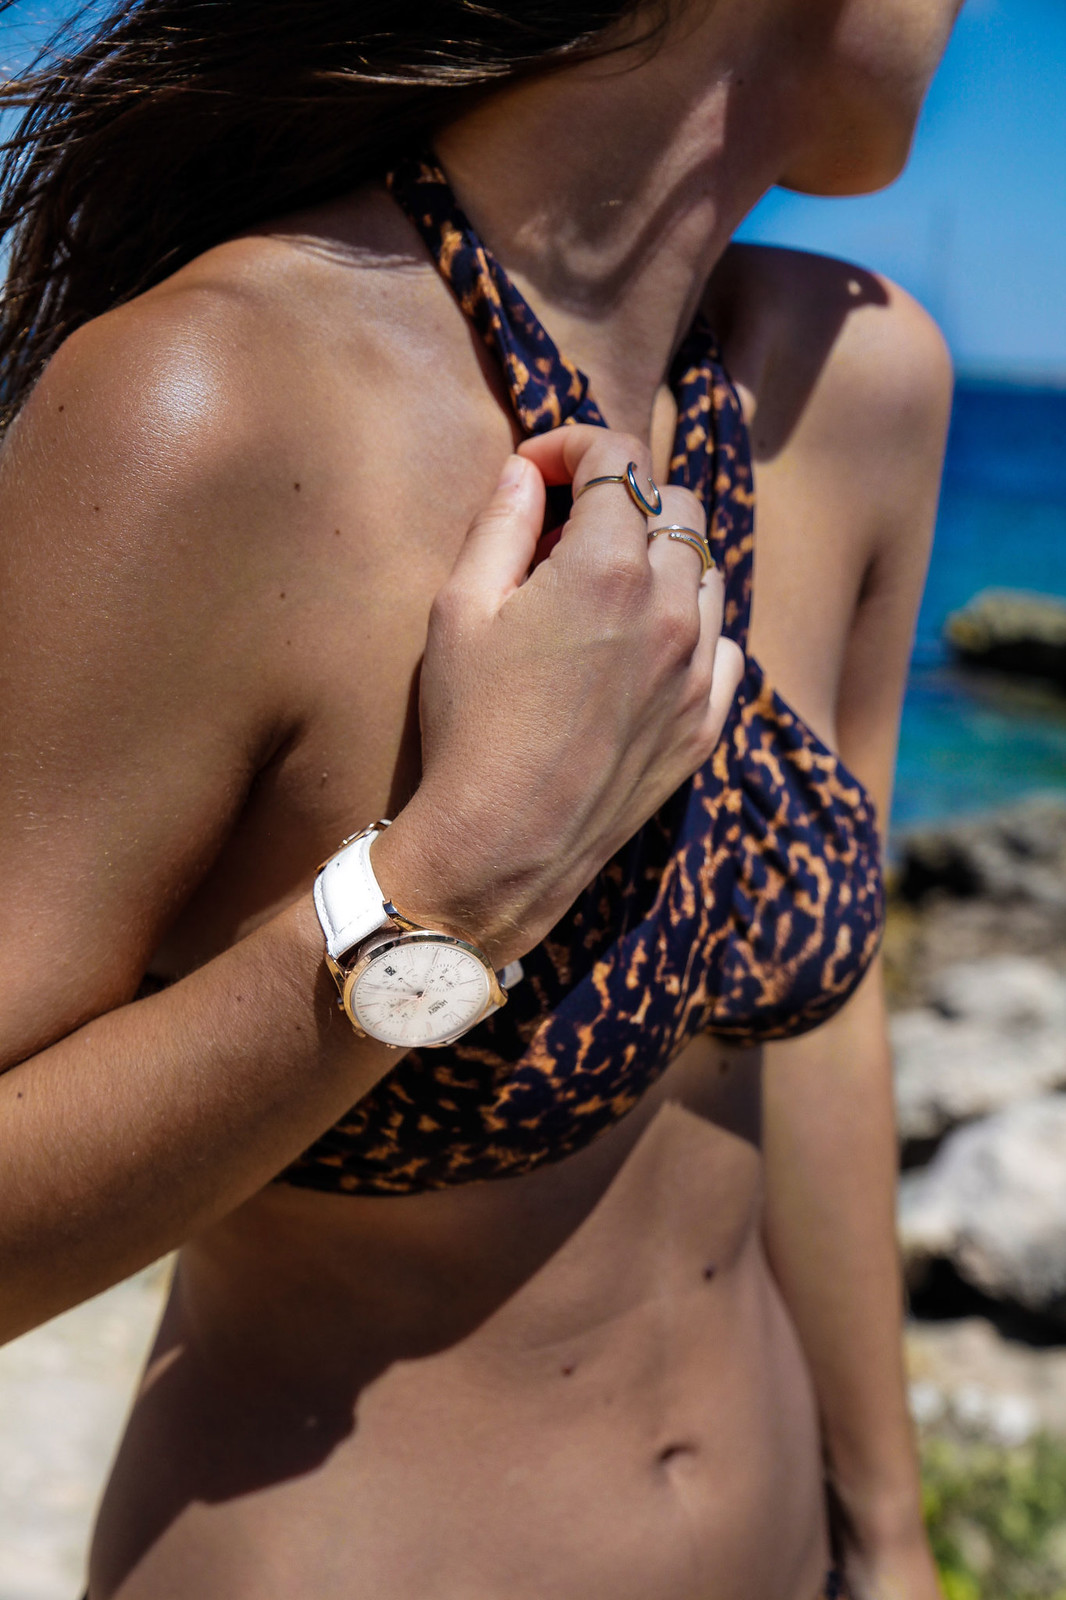 07_beachriot_leopard_swimwear_theguestgirl_summer_the_guest_girl_laura_santolaria_mediterranean_girl_mejor_bañador_2017_bikini_sexy_laura